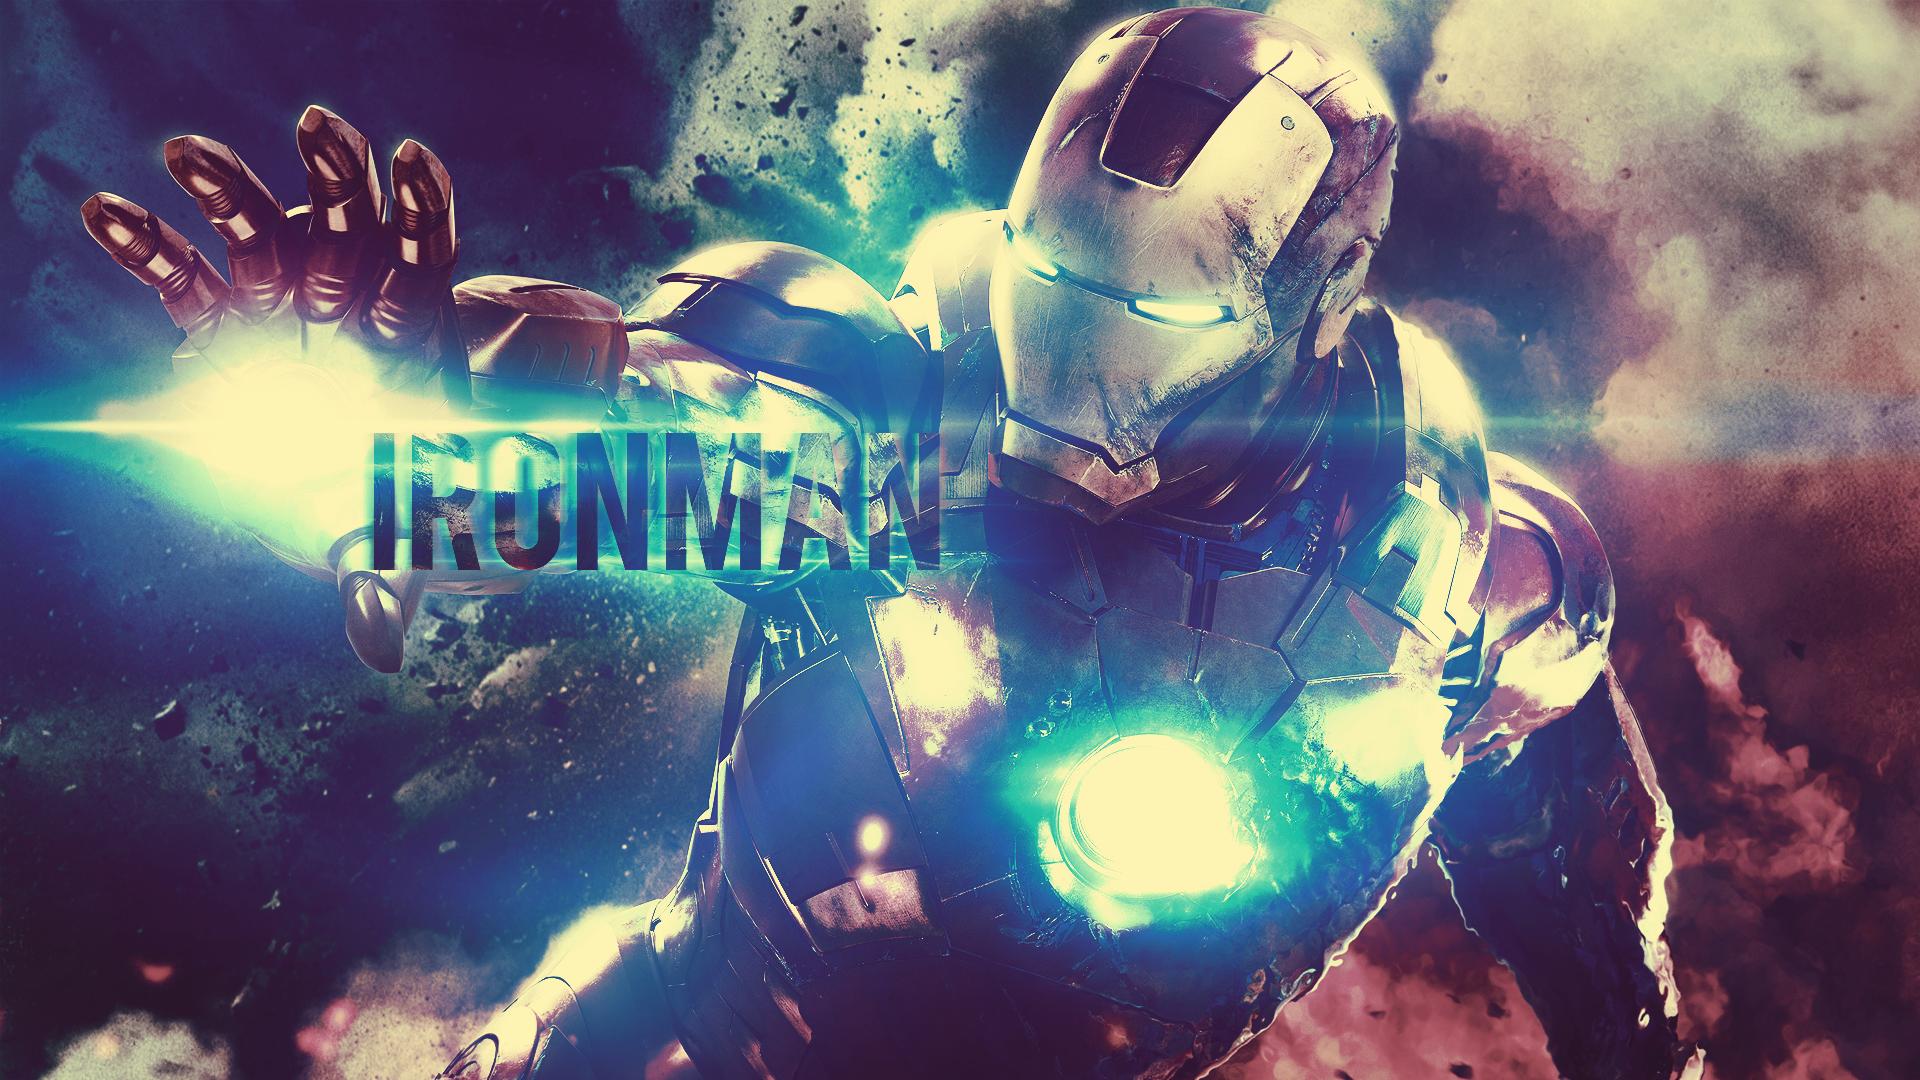 Iron Man 3 Hd Wallpapers High Resolution: Iron Man Wallpaper 1080P By JoaoRoberto2294 On DeviantArt